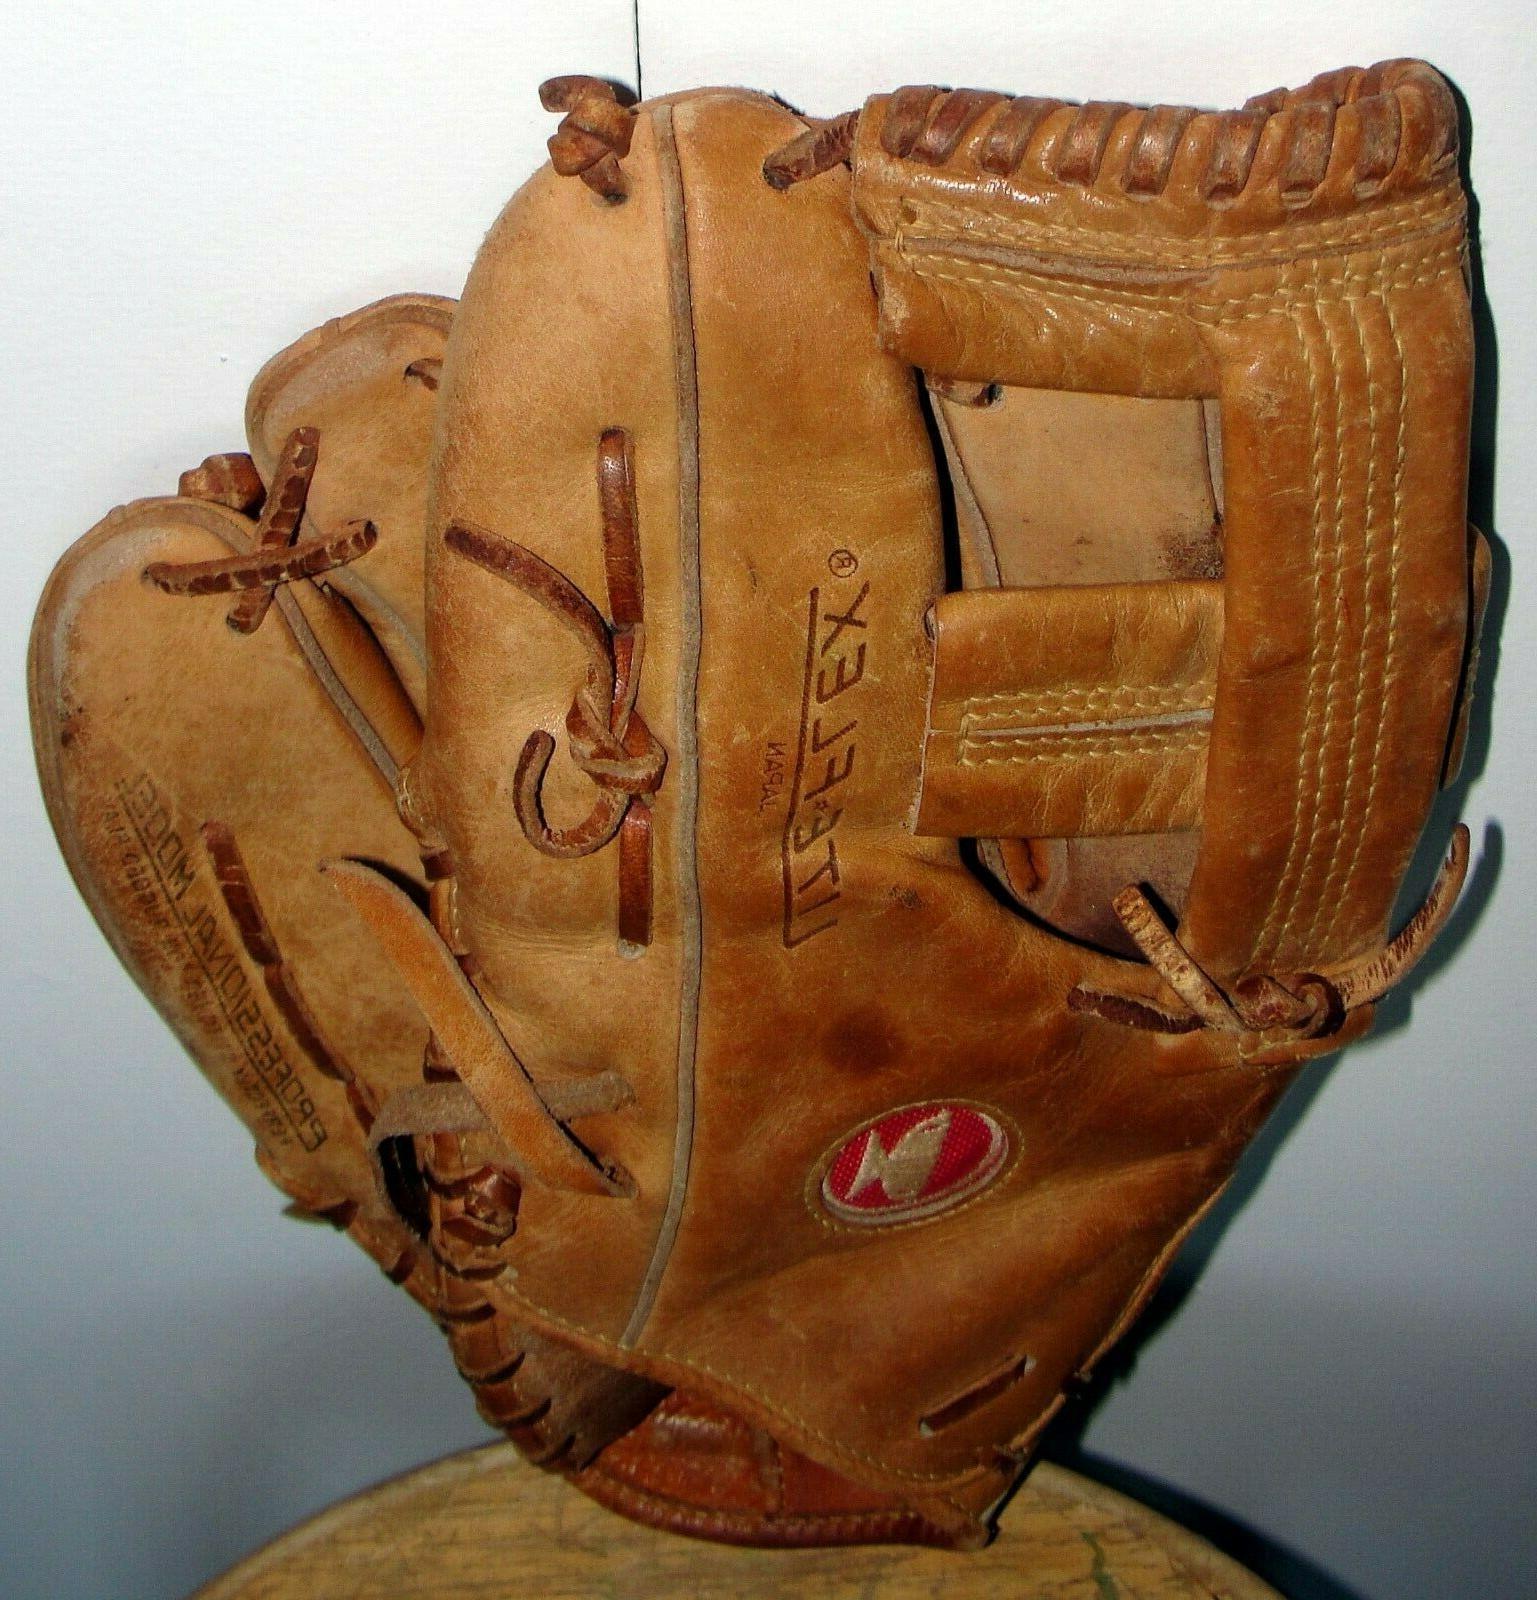 Mizuno Lite MTS-1 Baseball PAT.PEND